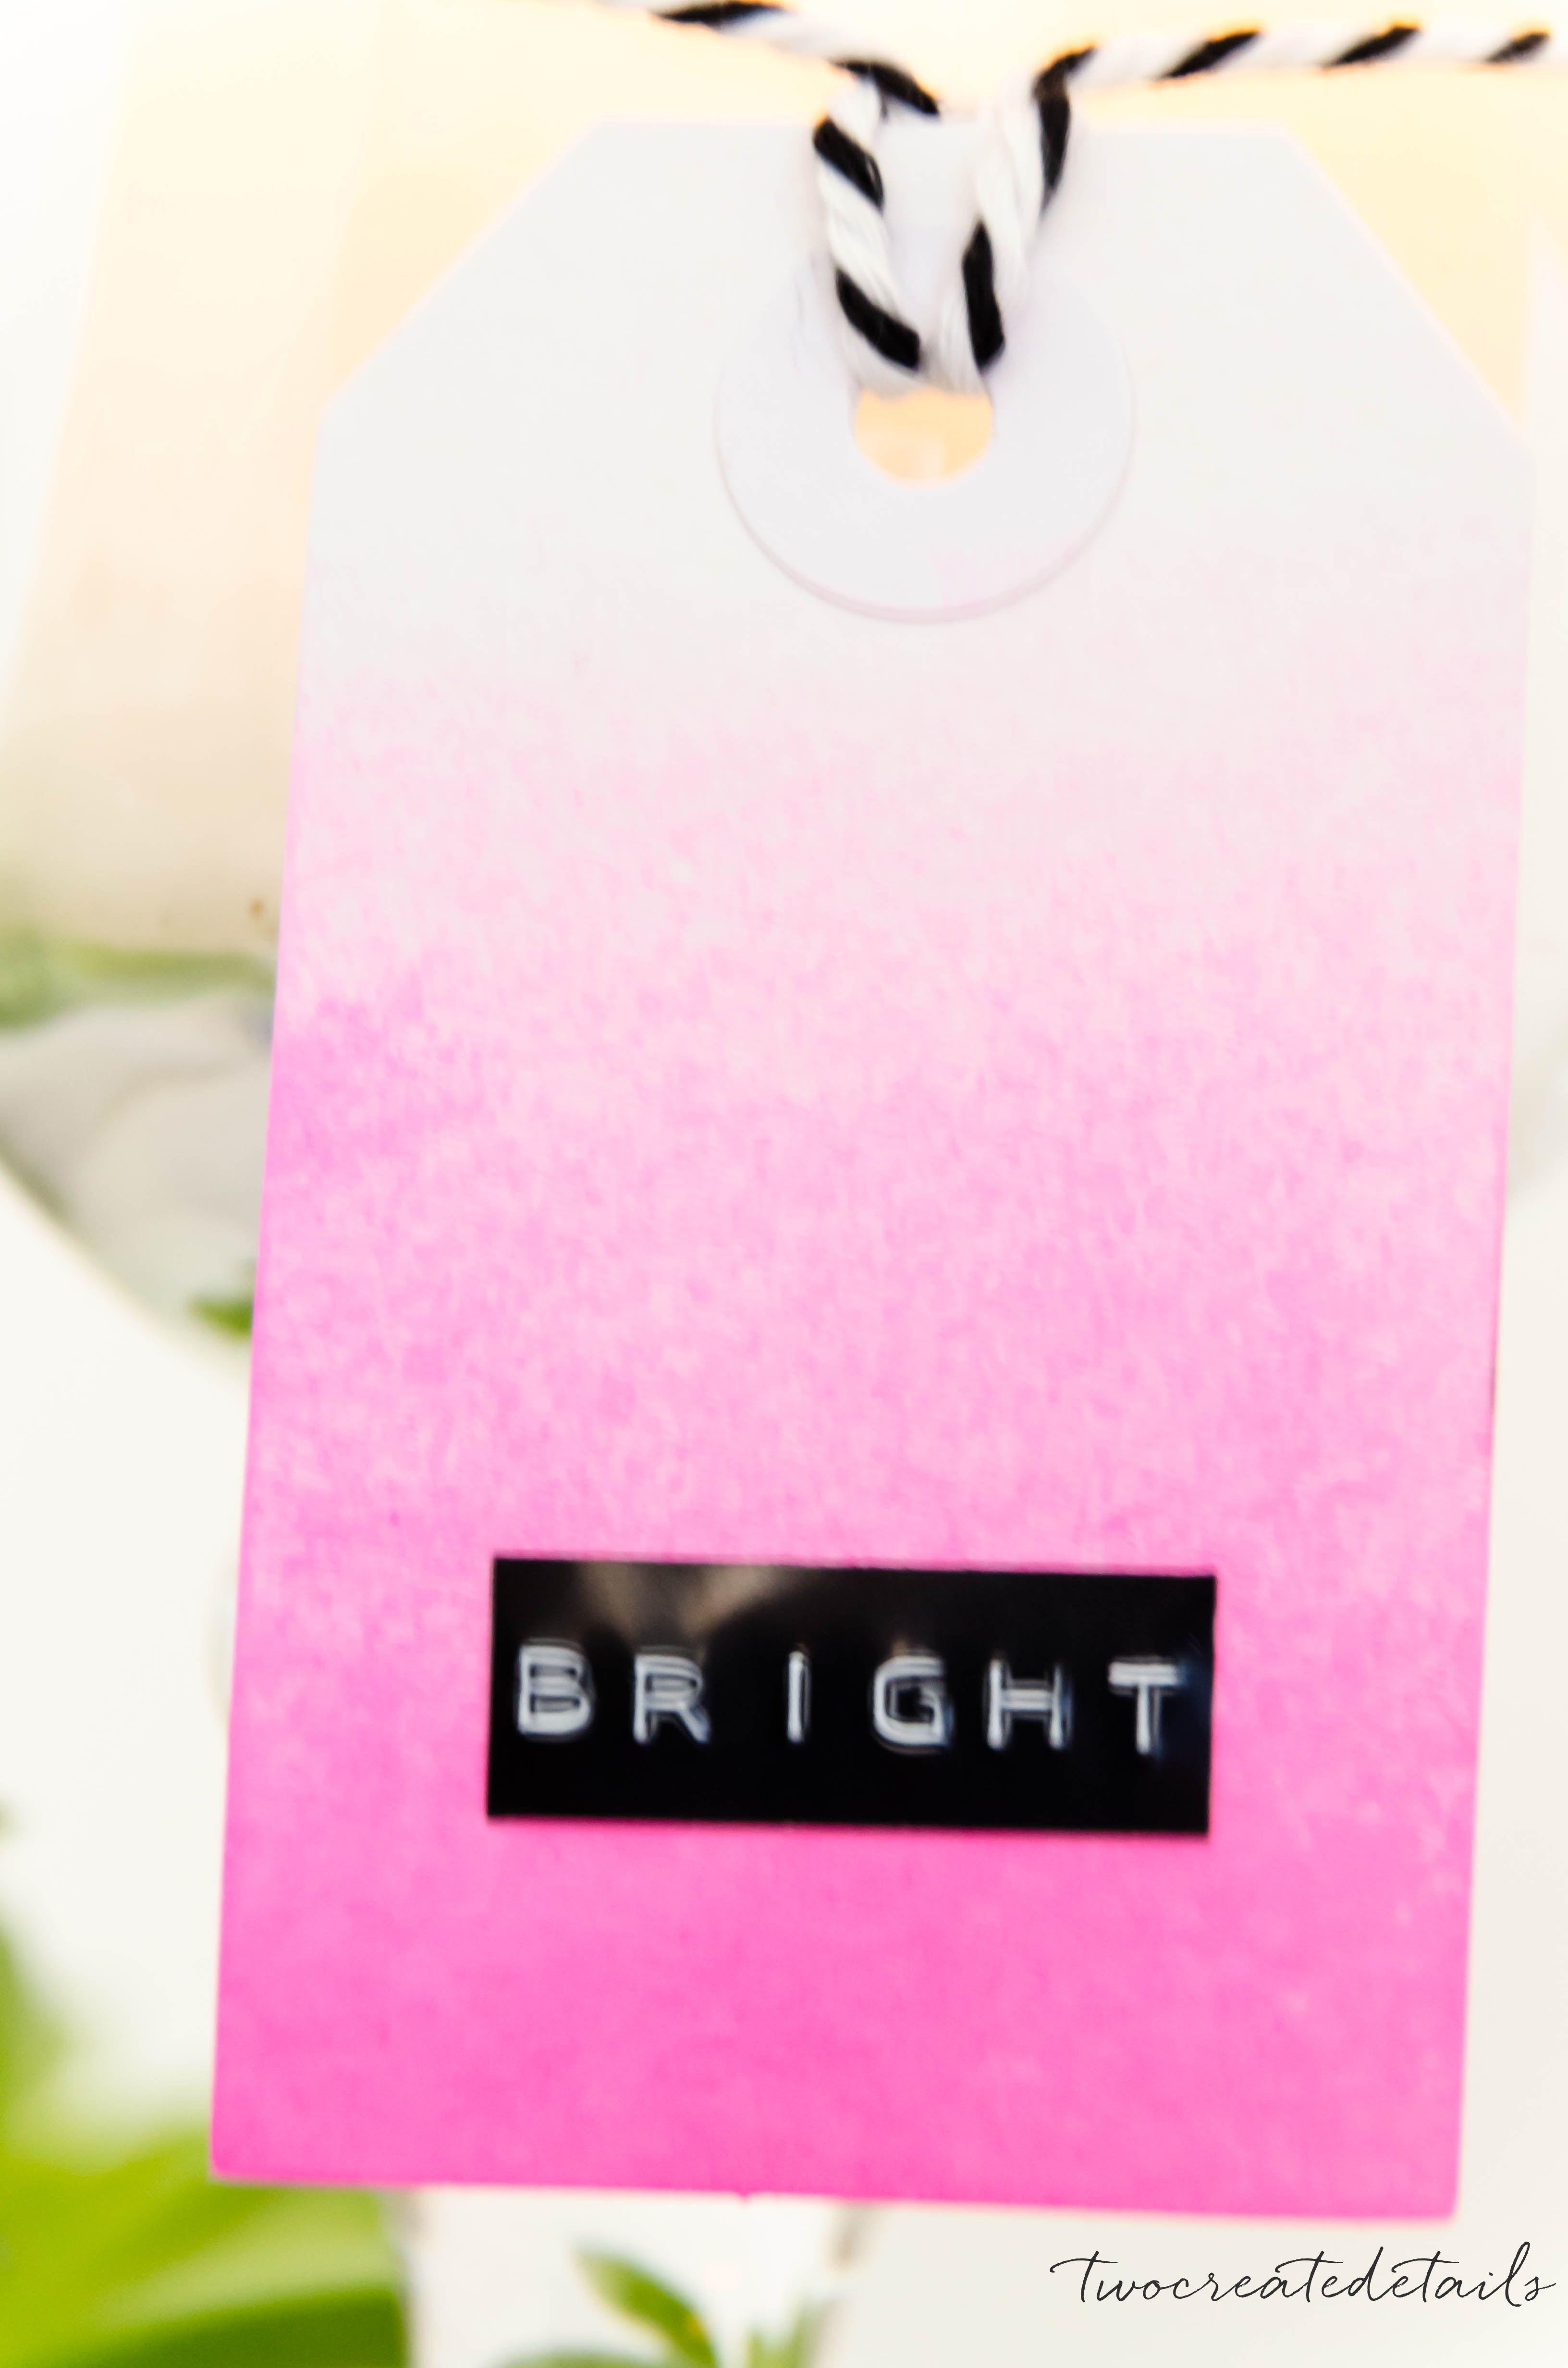 Ombré - Shining so bright